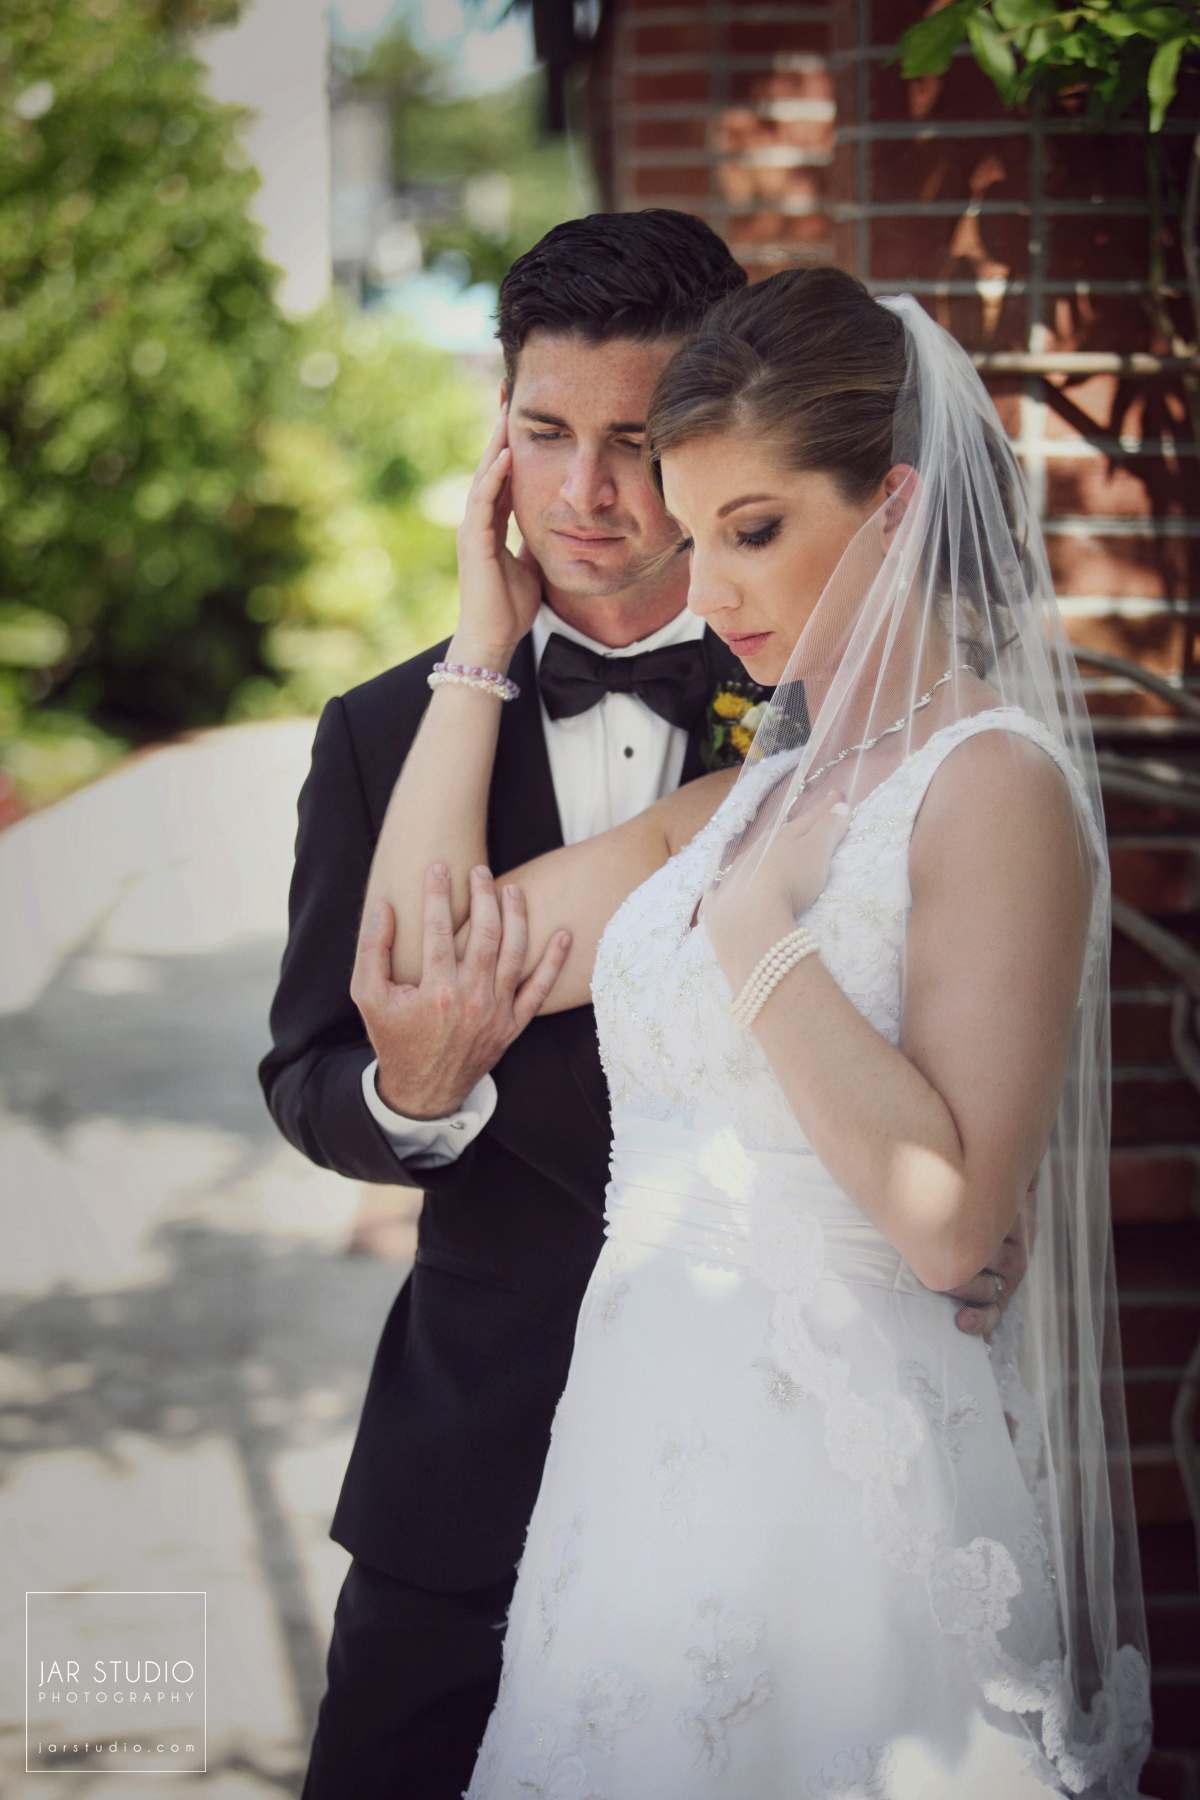 19-romantic-winter-park-wedding-photography-jarstudio.JPG